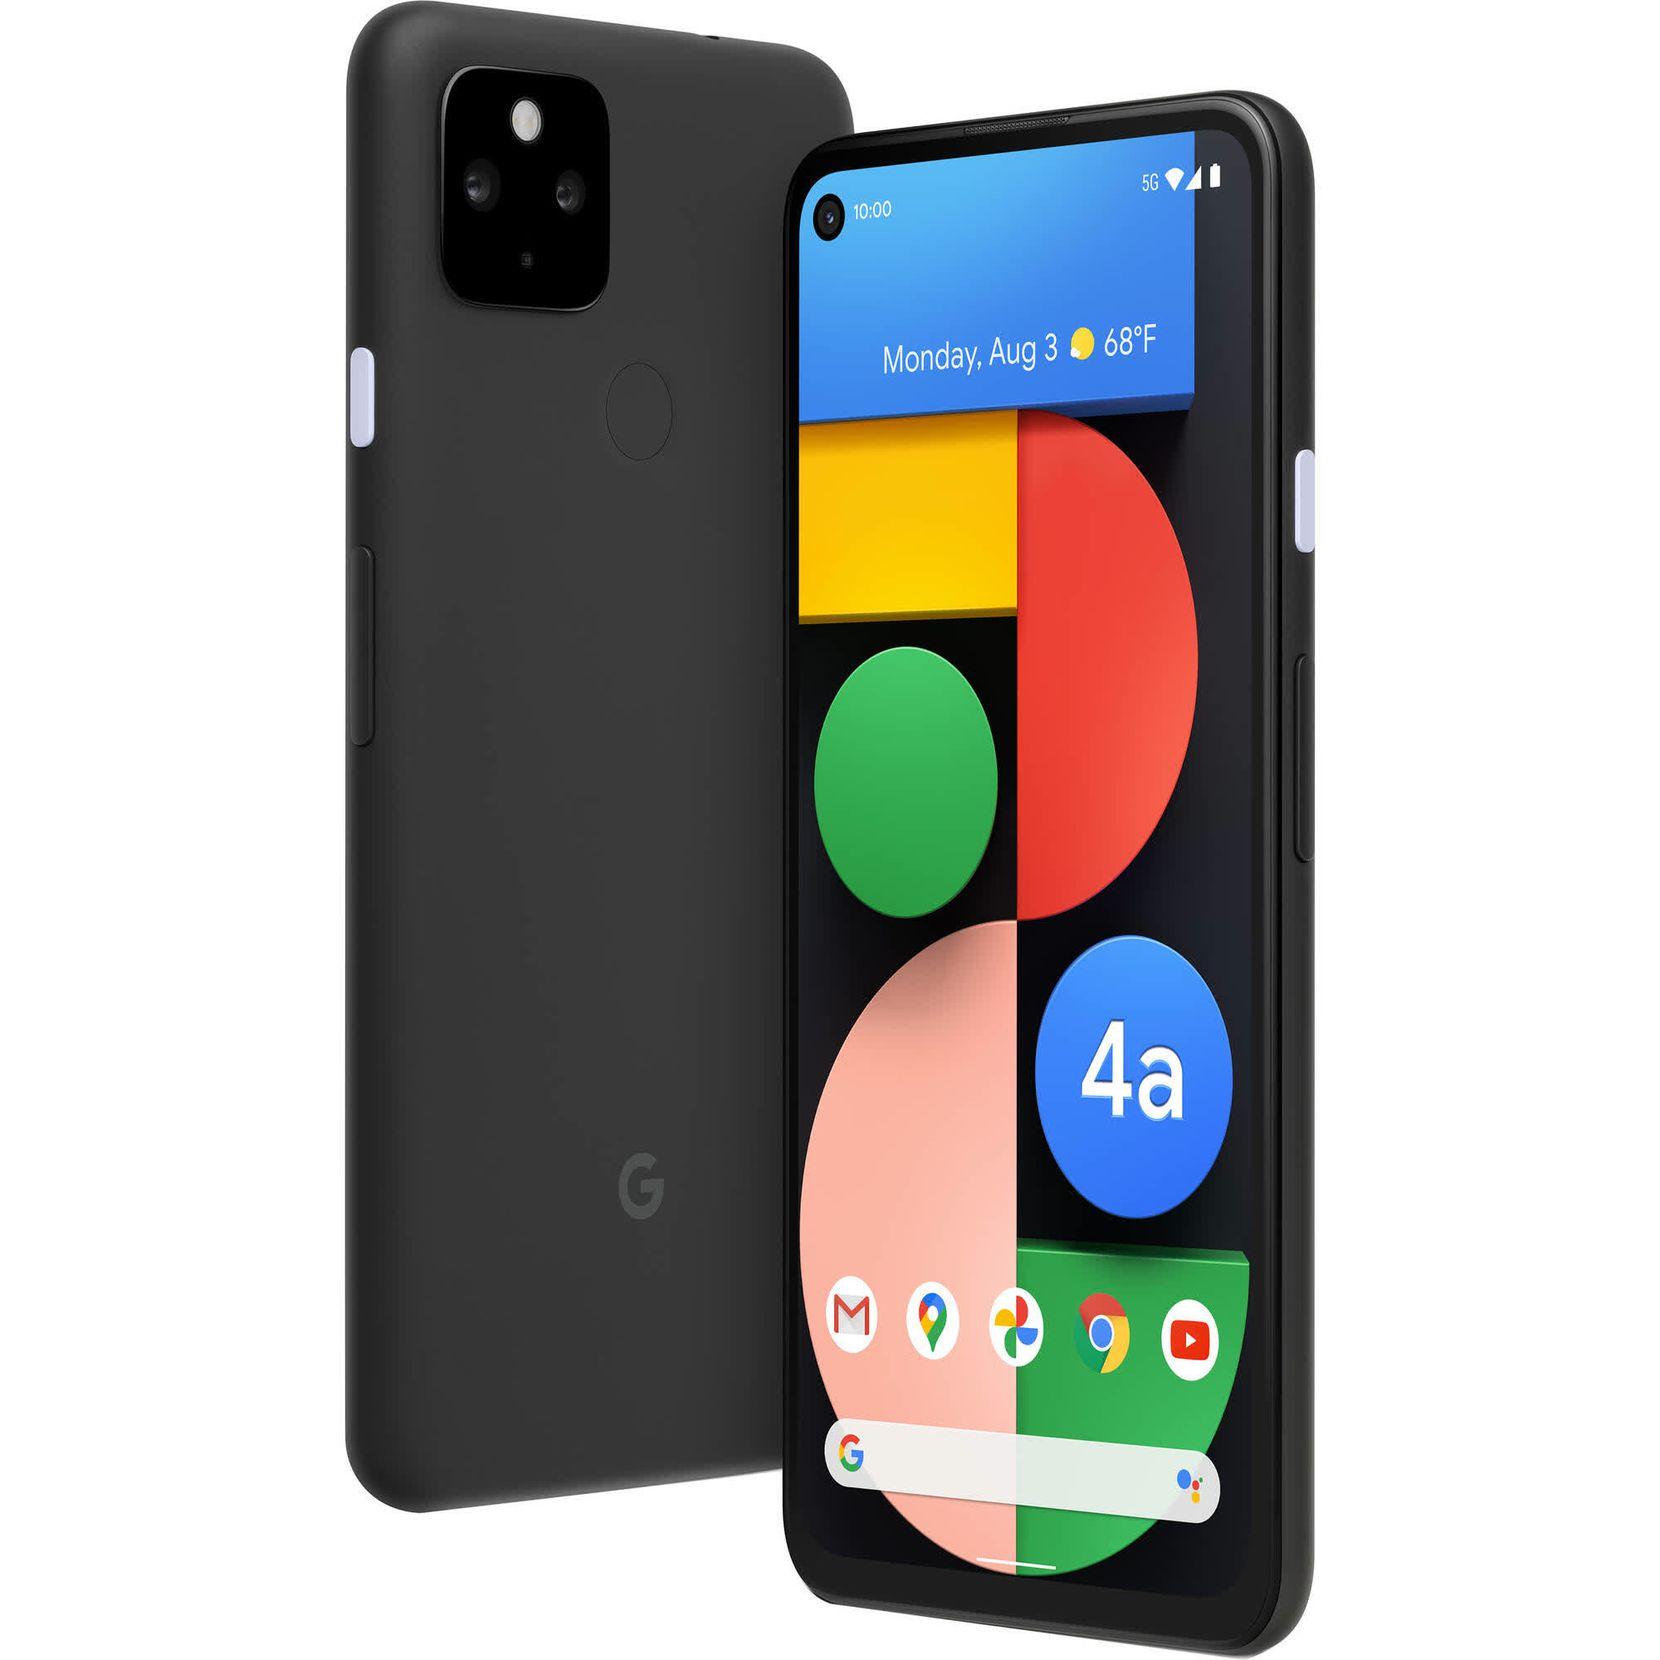 The Google 4a 5G.